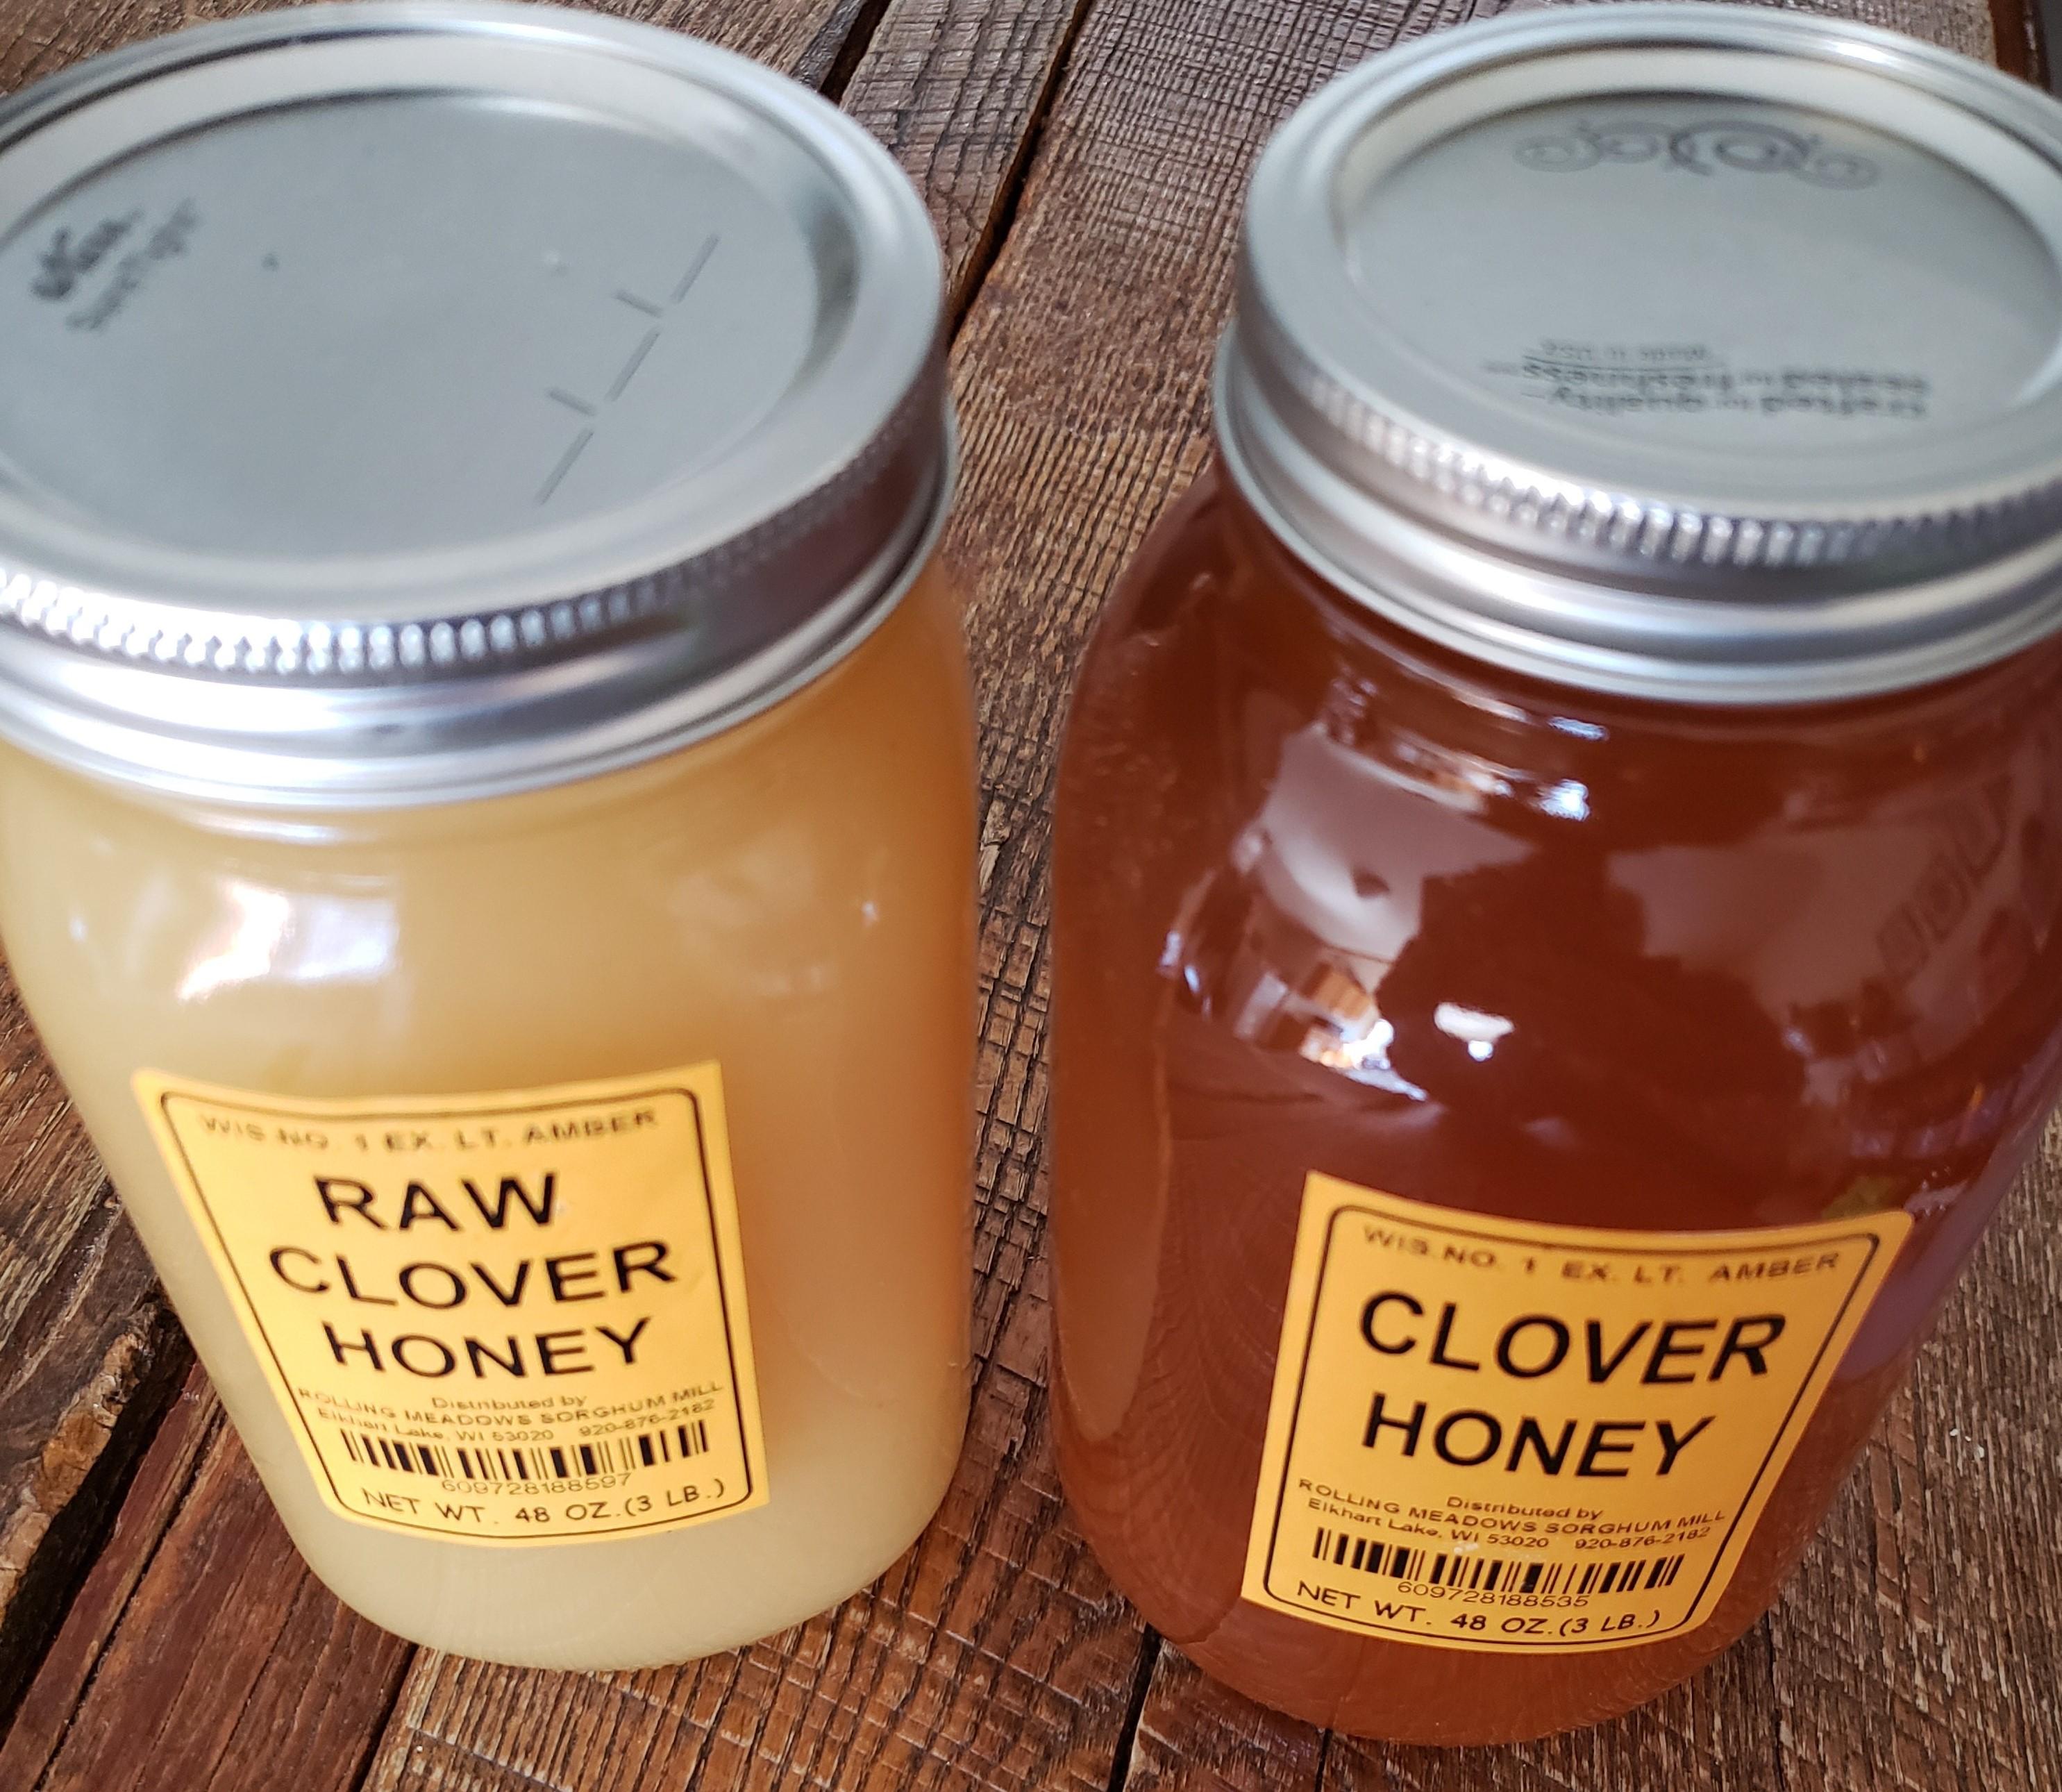 3# Jar Rolling Meadows Honey